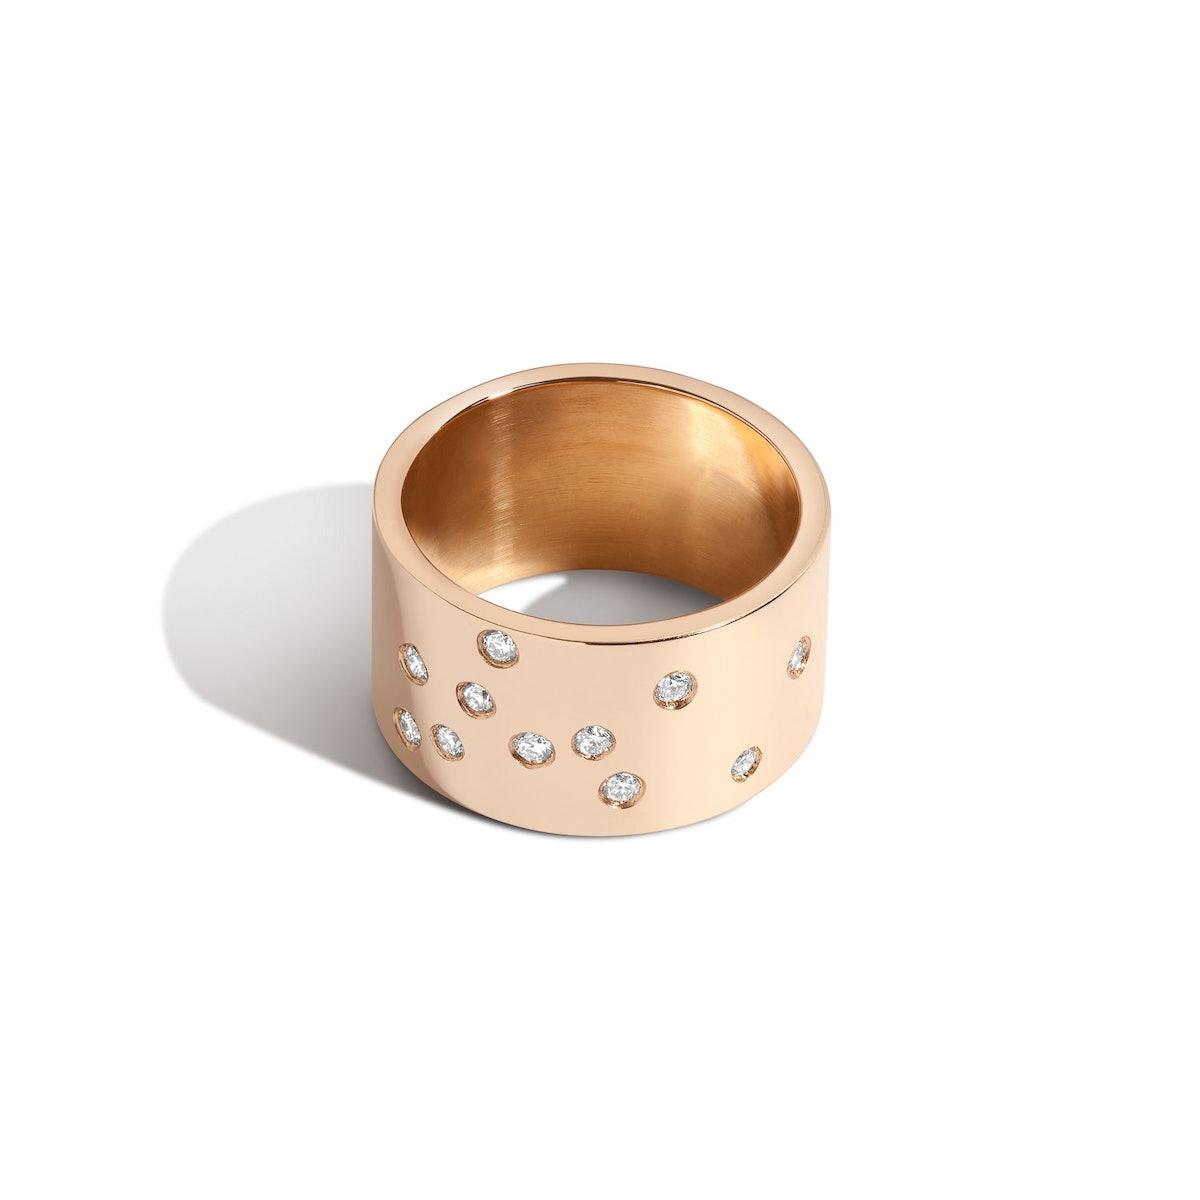 Zodiac Reveal Ring